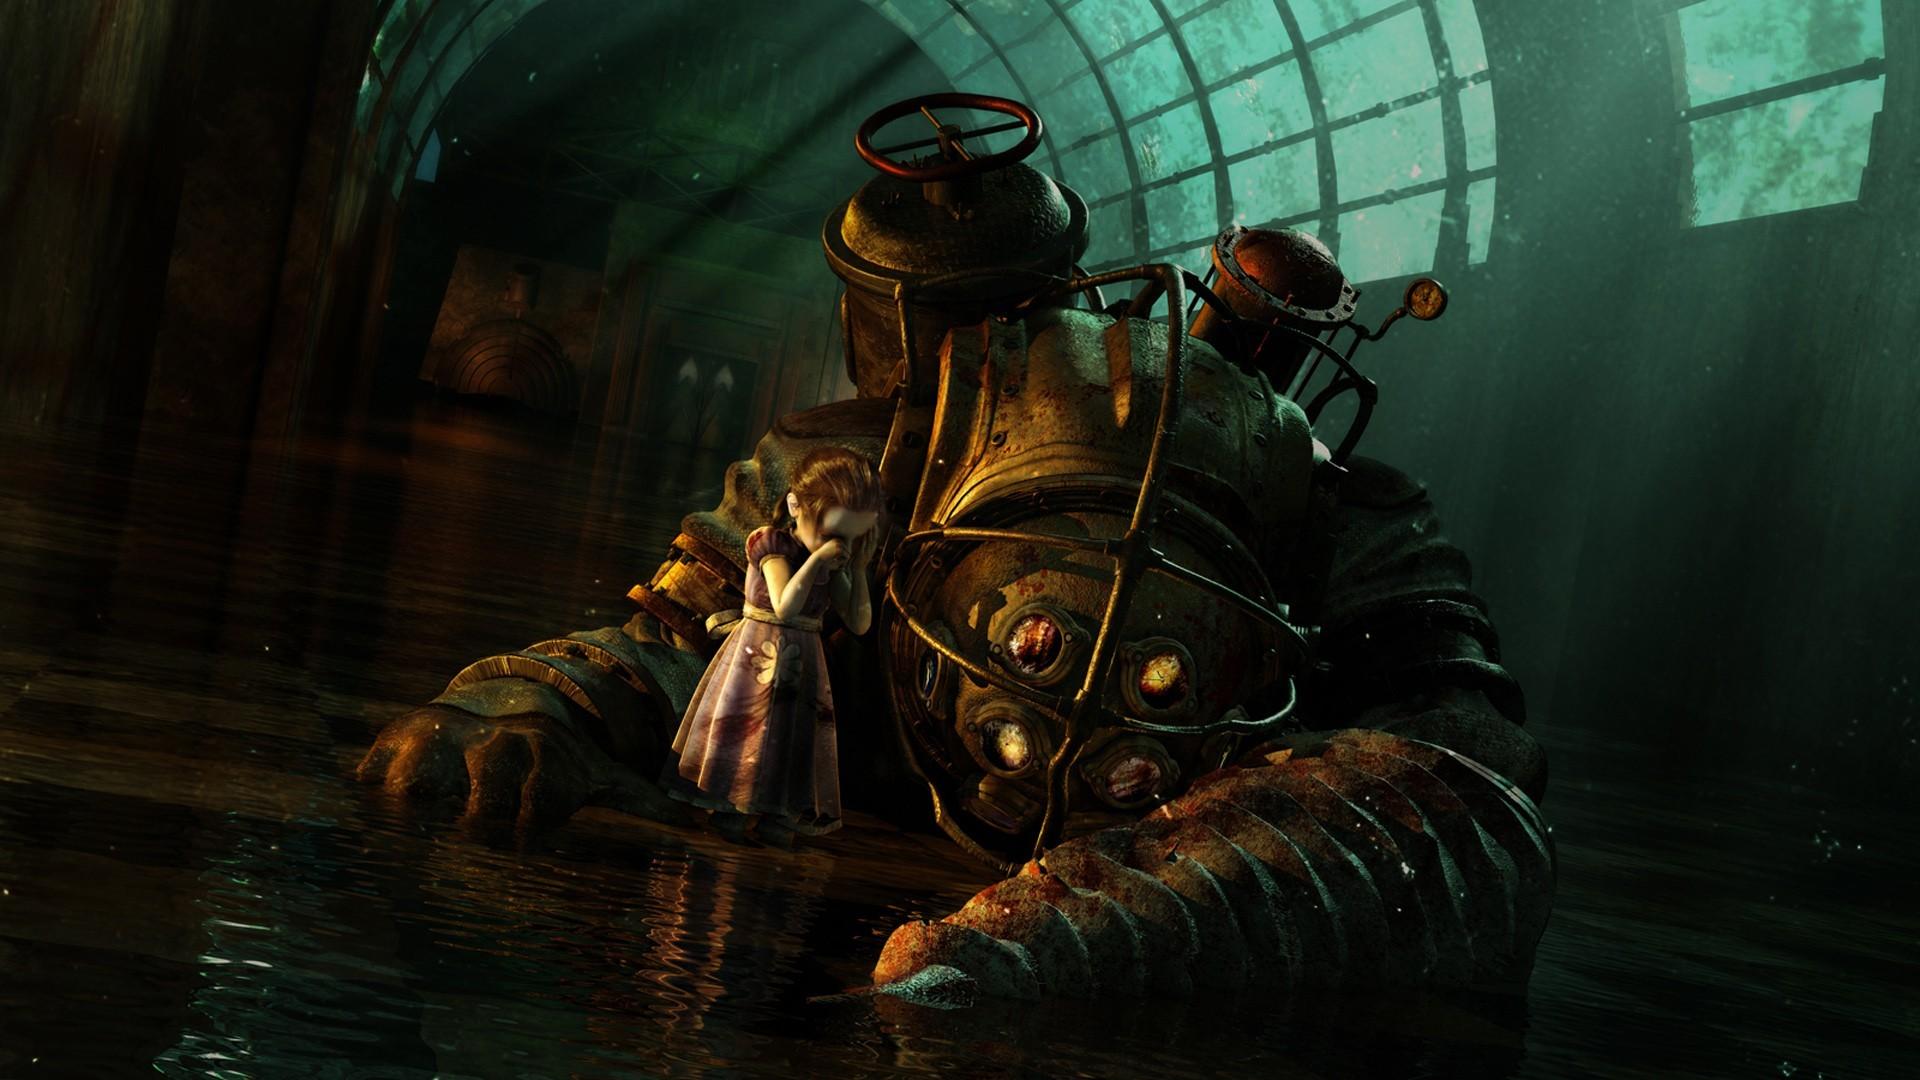 Free Download Bioshock Big Daddy Wallpaper Picture 2r8cqftw